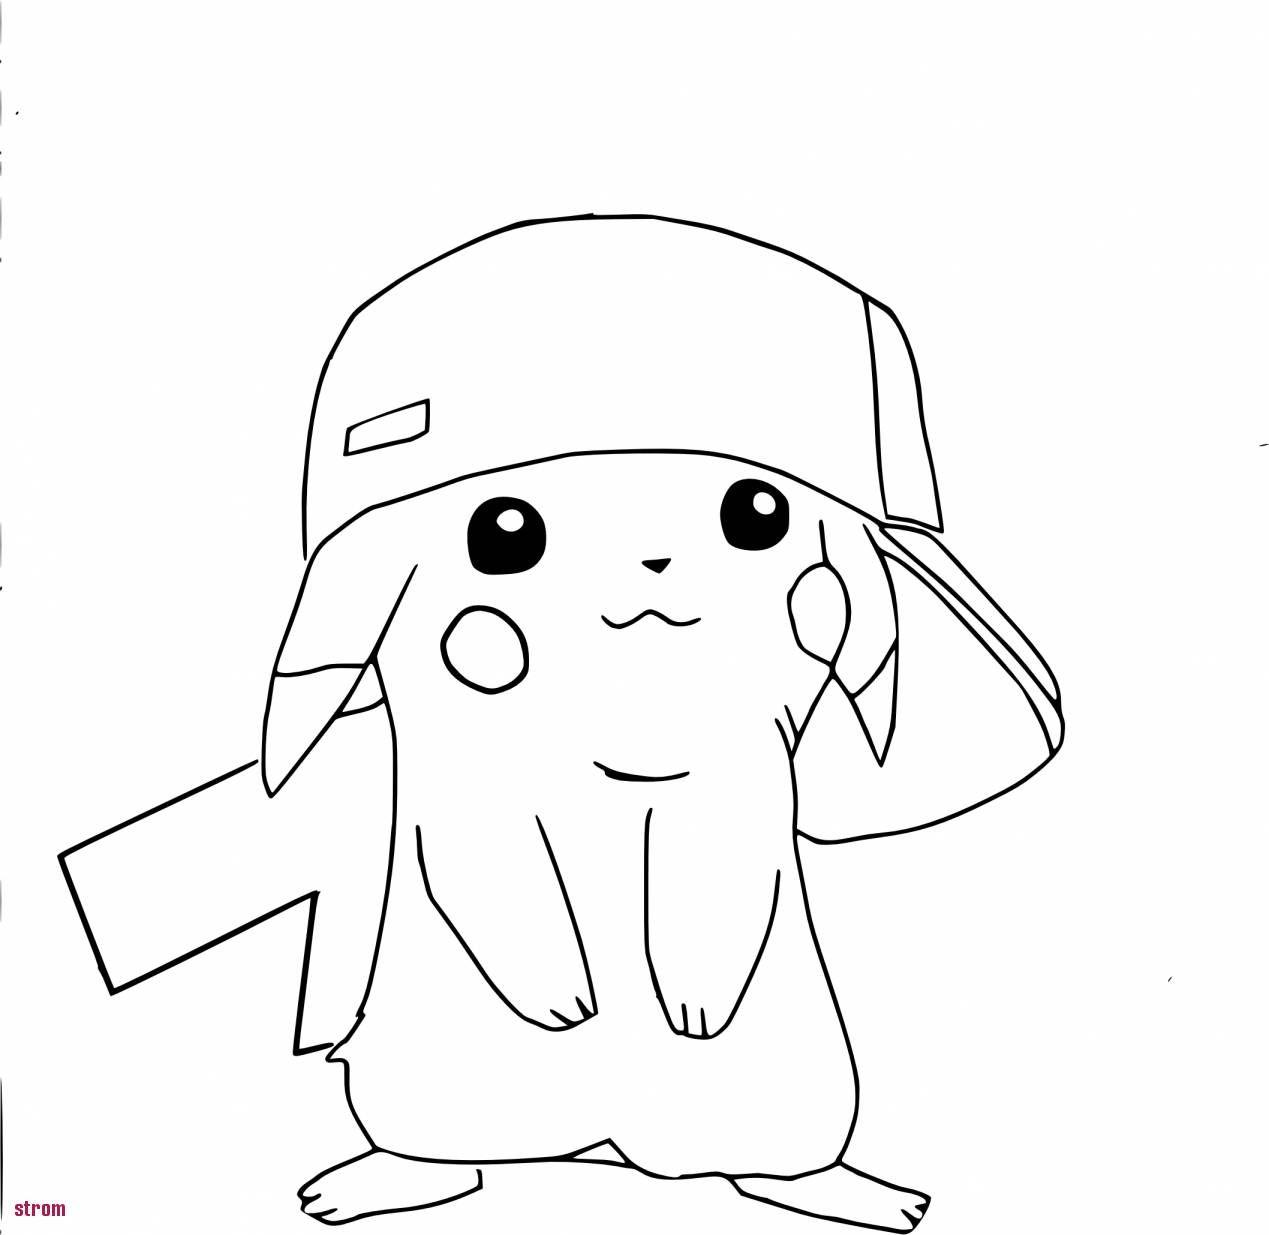 Dessin Facile Recherche Google Coloriage Pikachu Coloriage Kawaii Coloriage